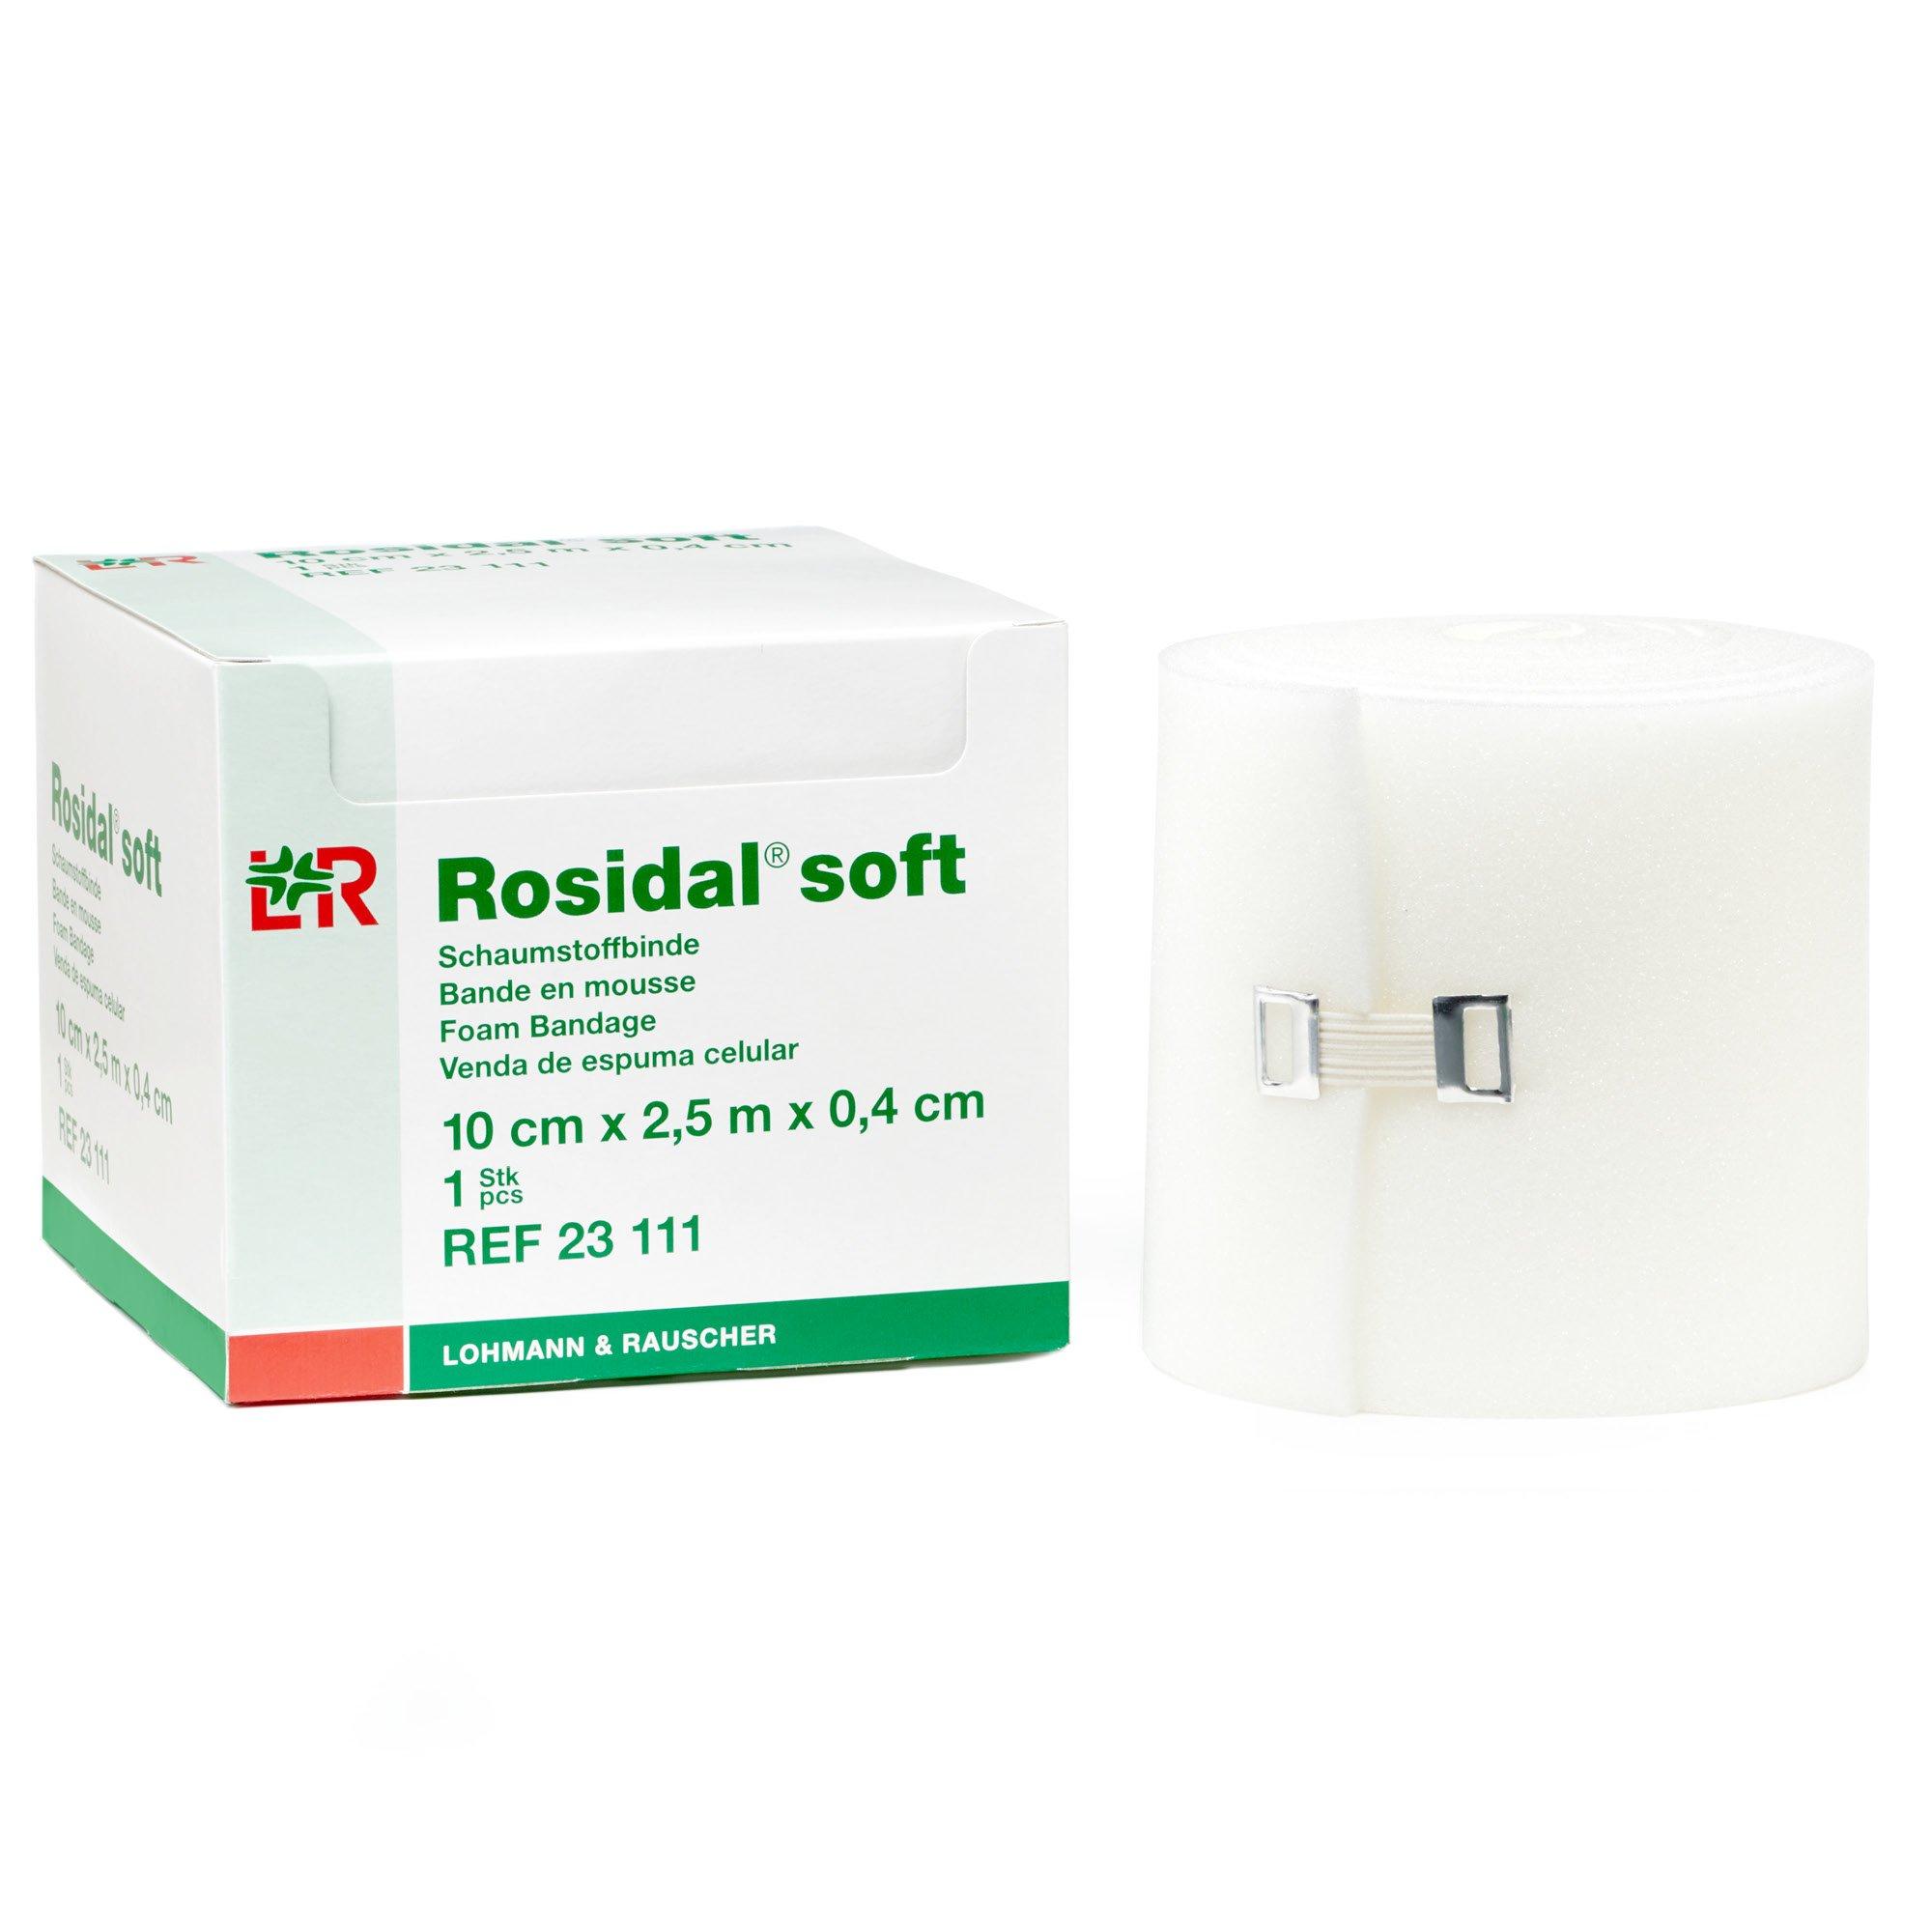 Rosidal Soft Foam Padding, Foam Dressing & Lymphedema Padding for Compression Distribution, 10cm x .4cm x 2.5m, Case of 24 Rolls